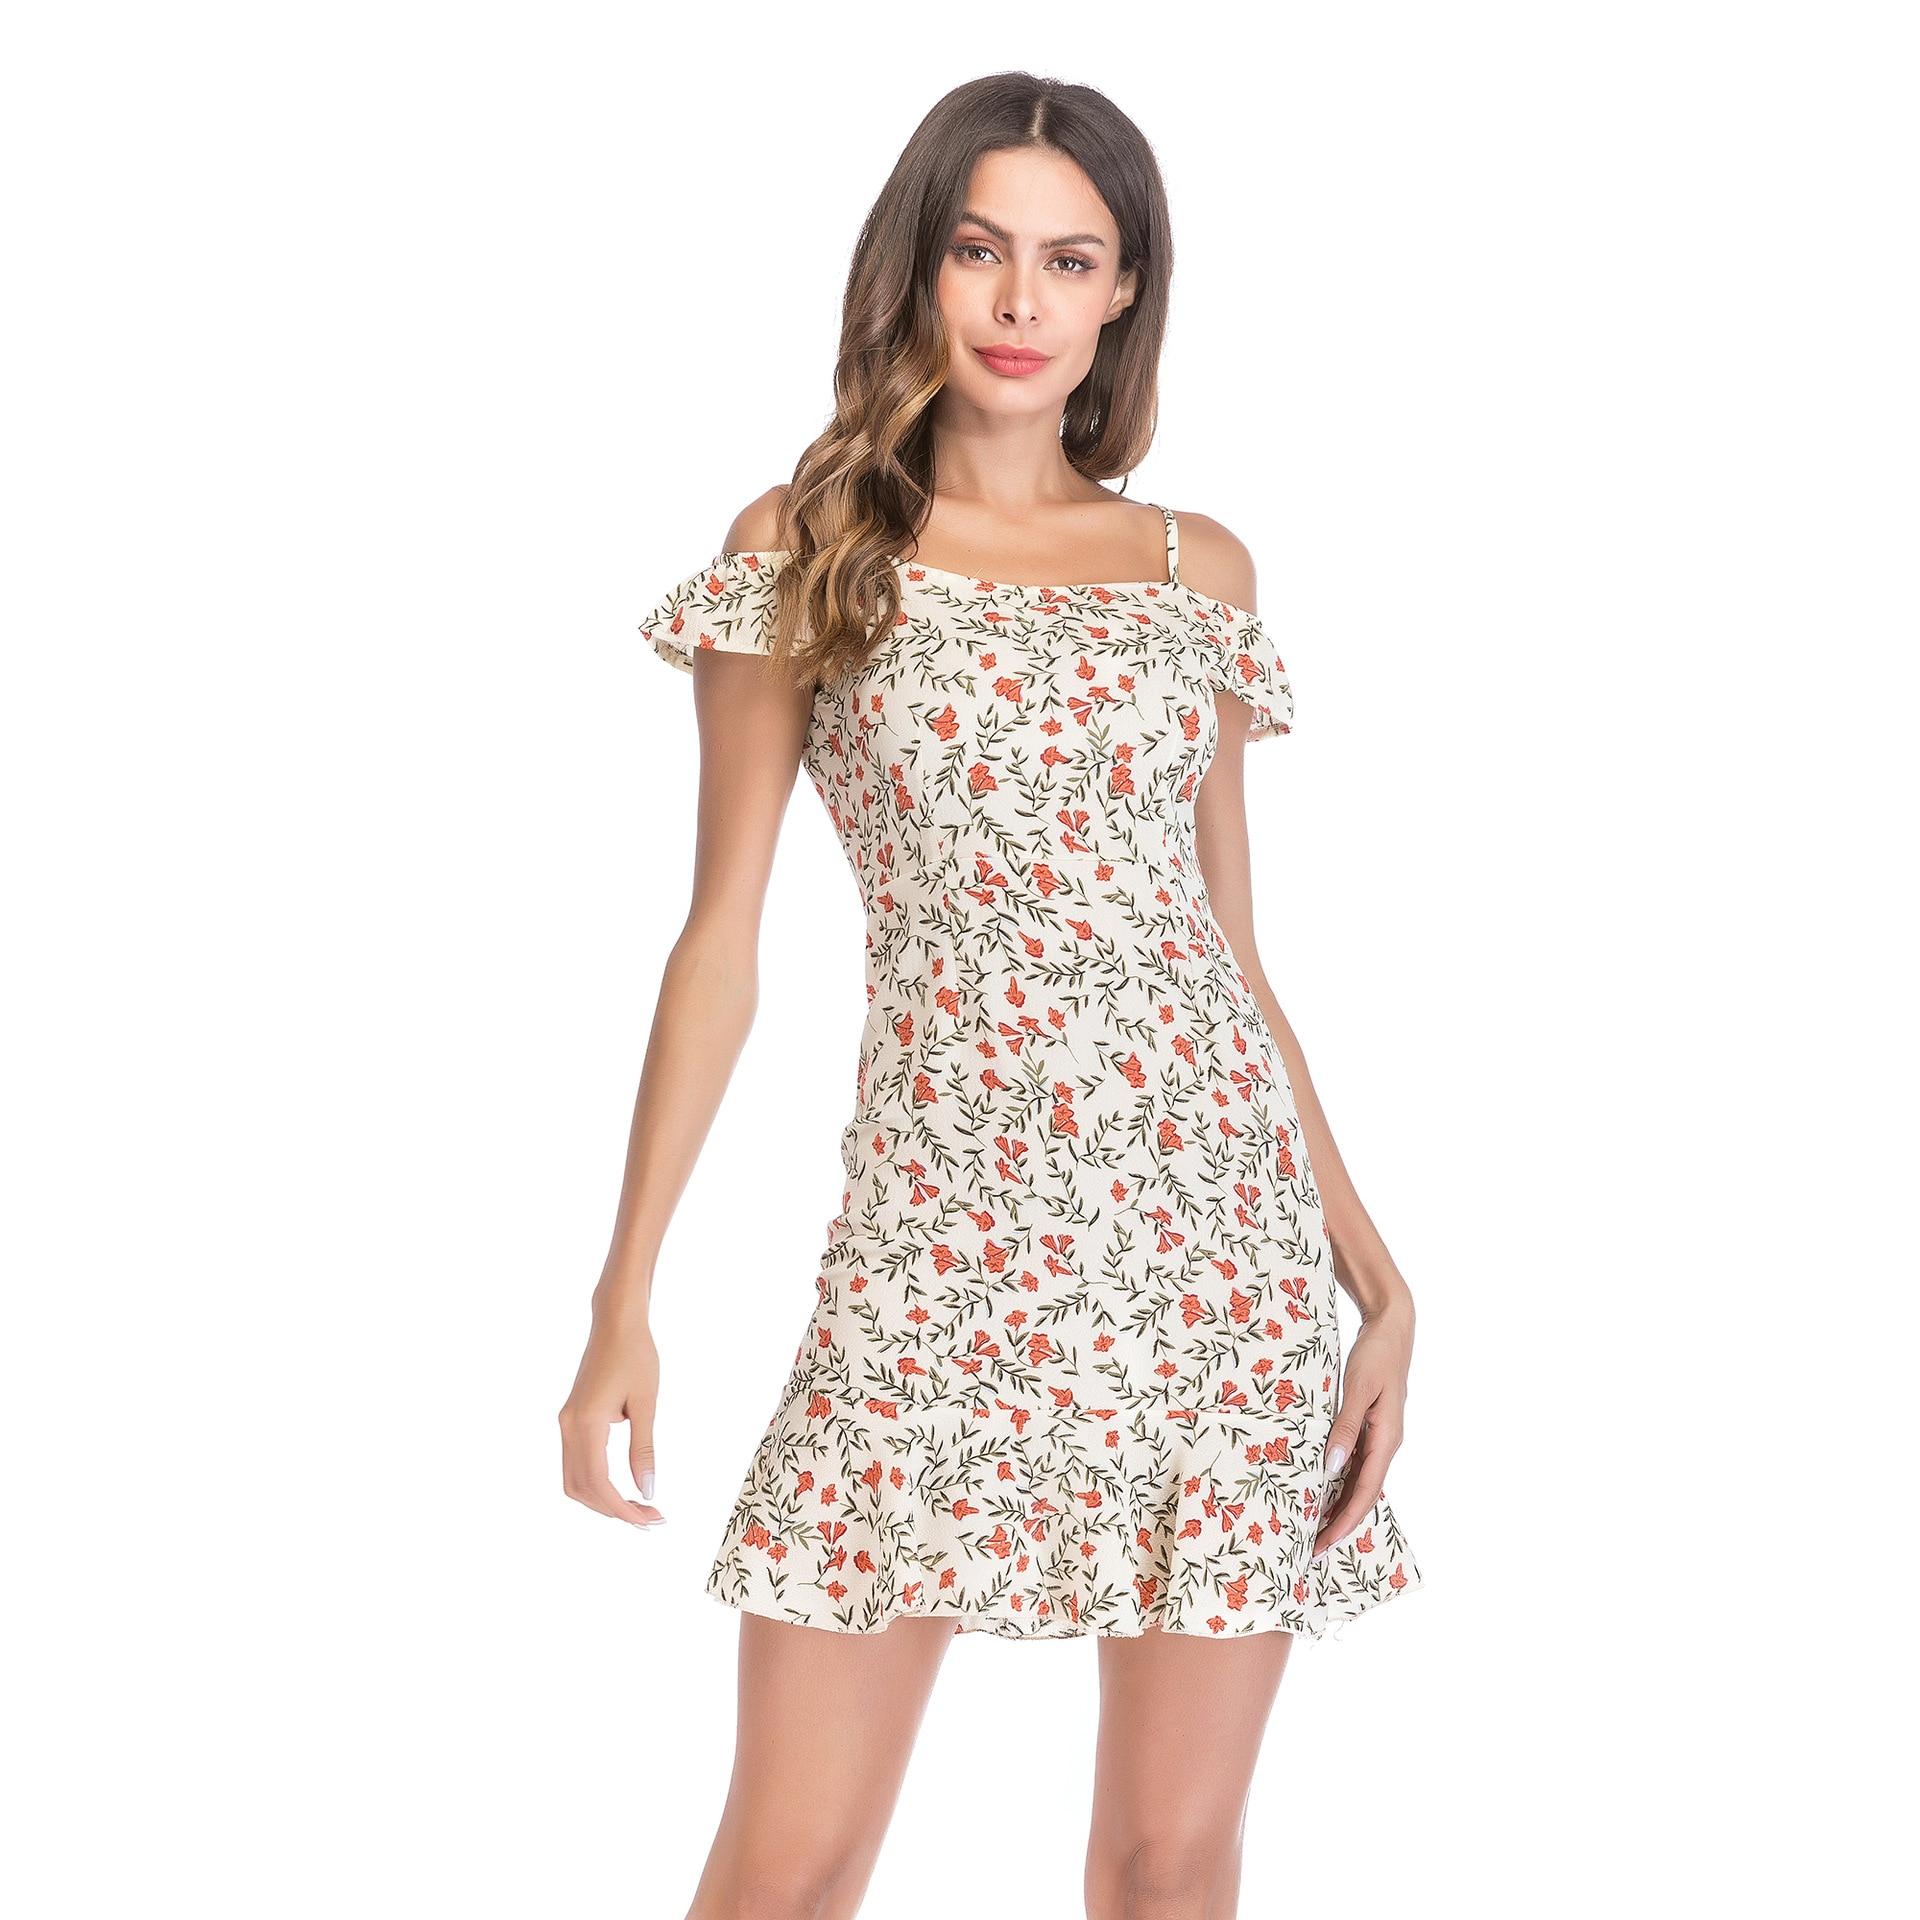 20dd8e0aadc8 2018 Summer Dress Women Chiffon White Dress Party Off Shoulder ...